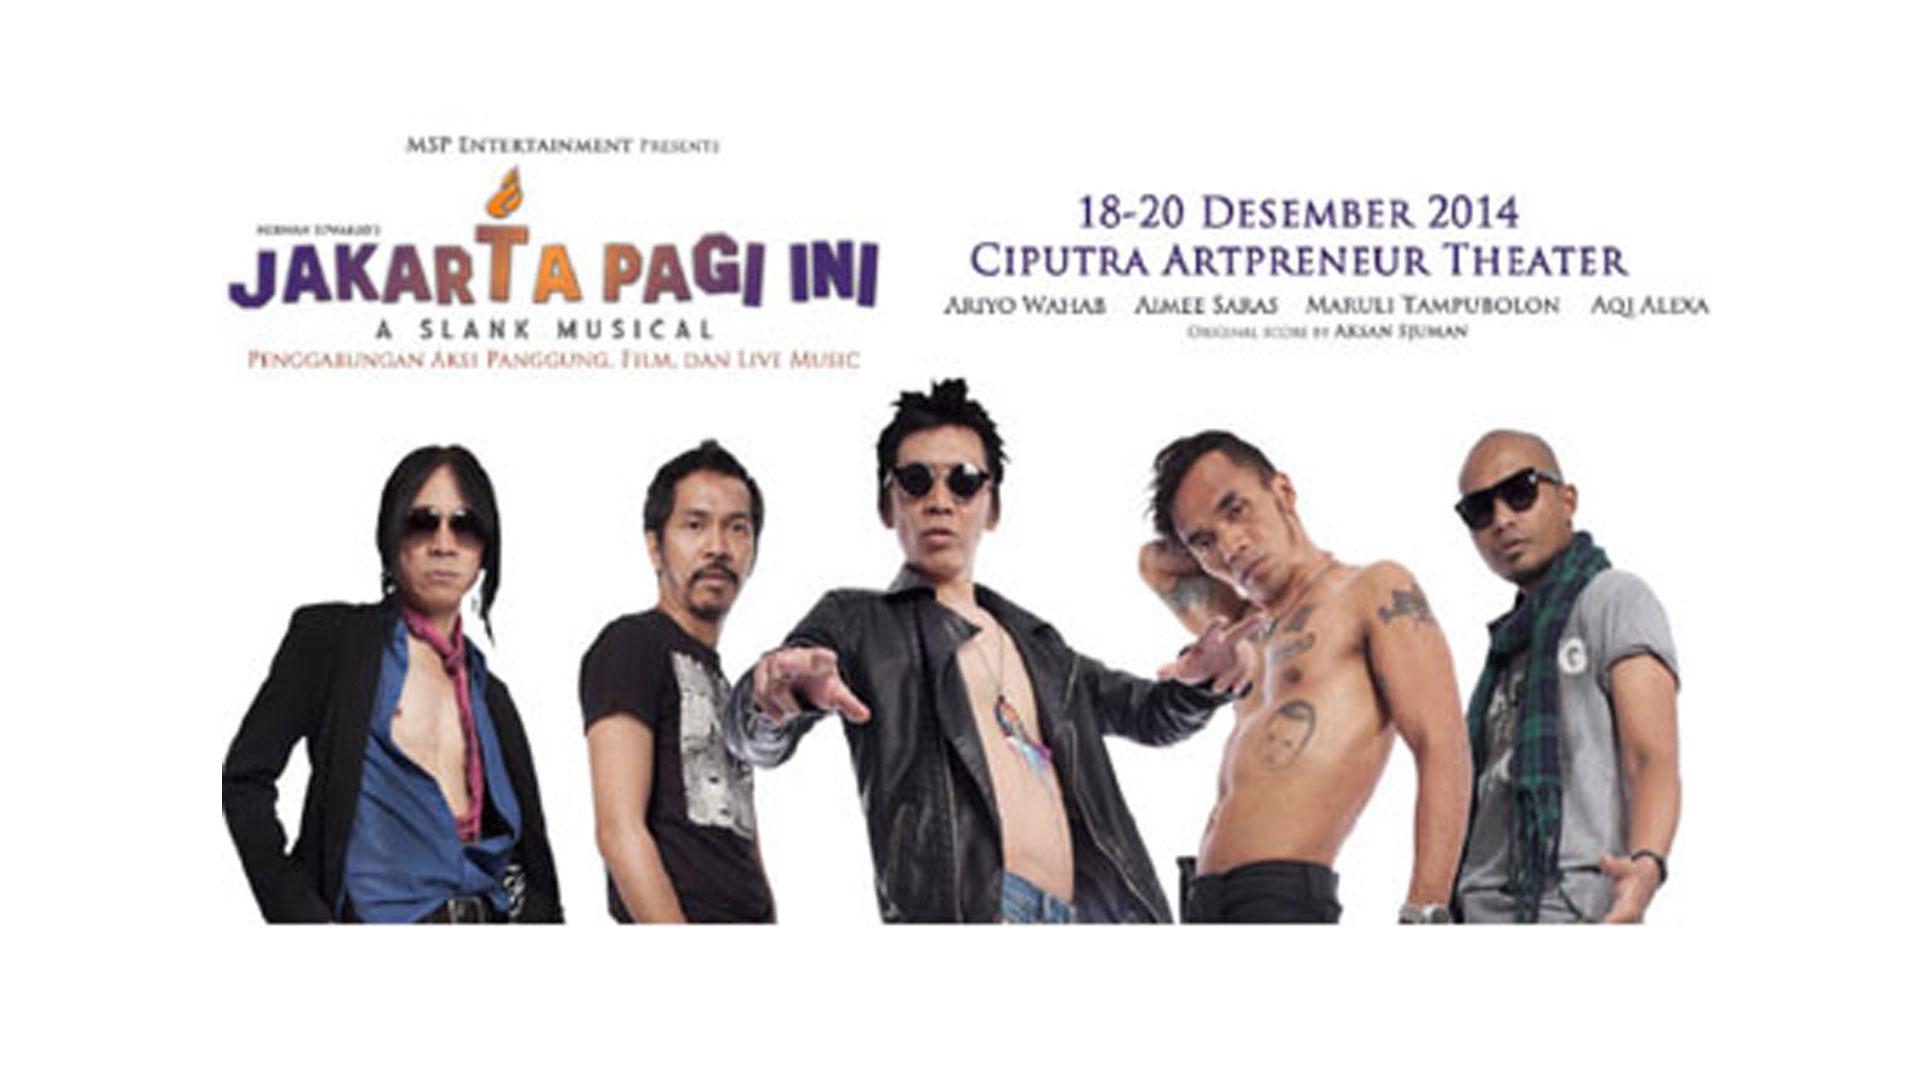 Jakarta Pagi Ini - A Slank Musical